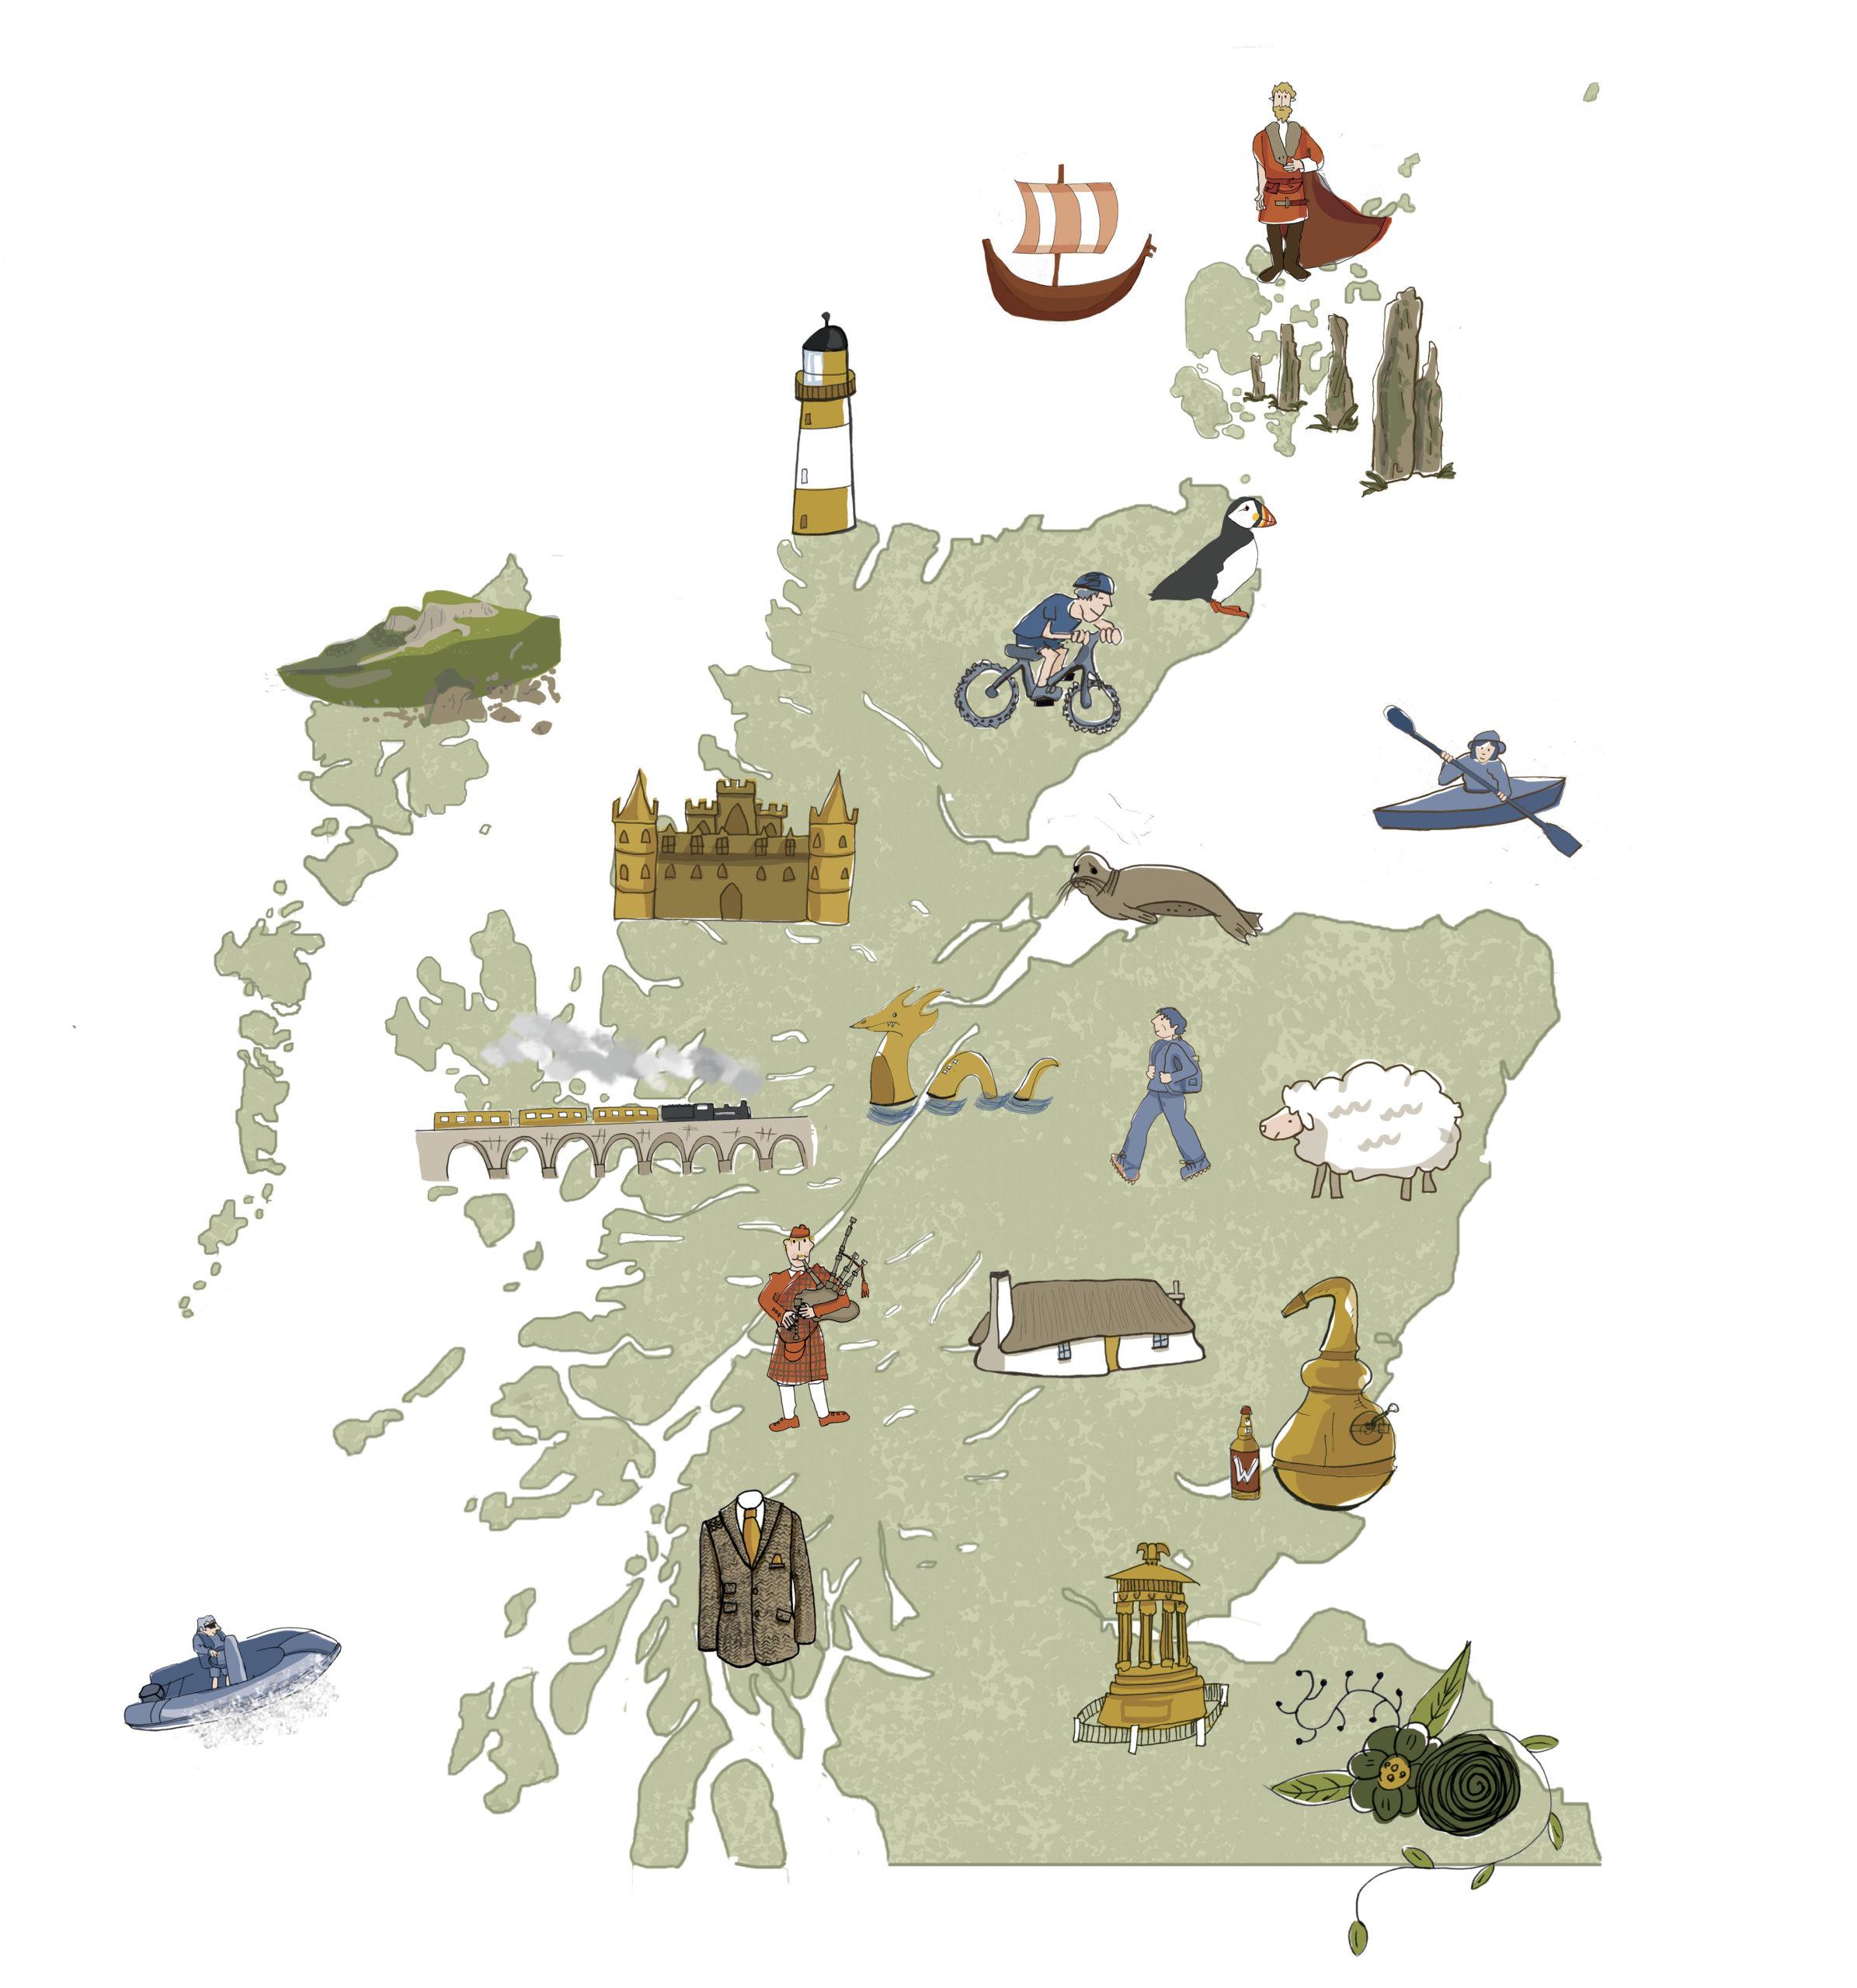 Carte illustrée de l'Ecosse